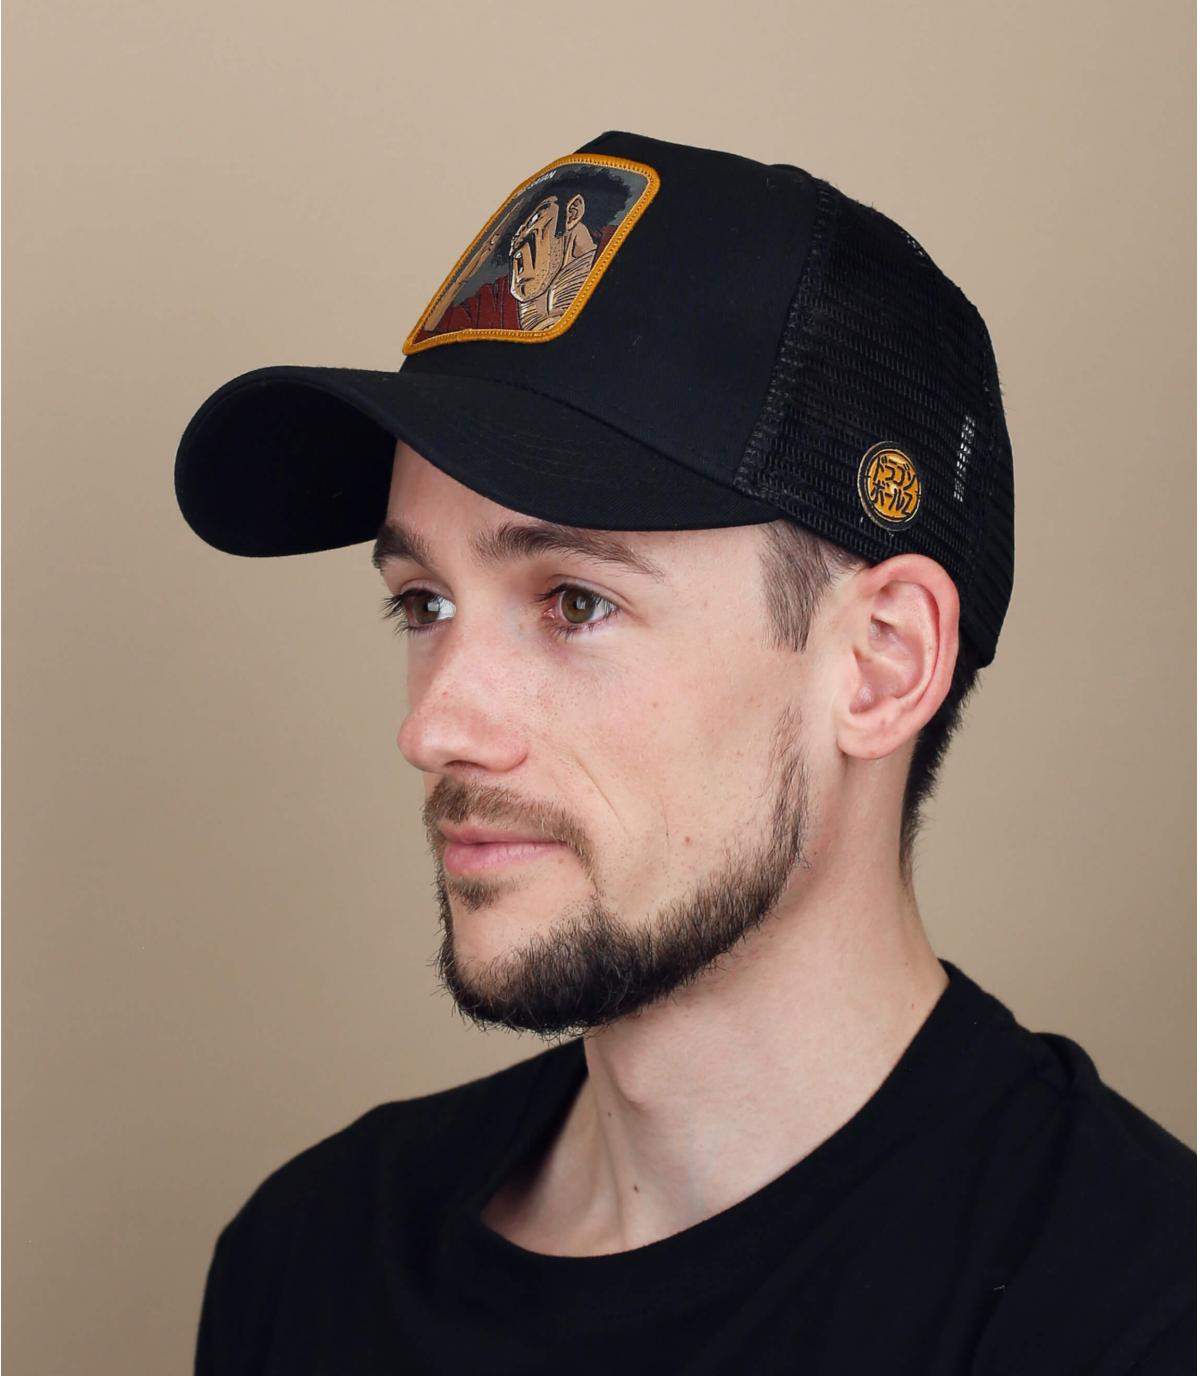 MrSatan DBZ trucker